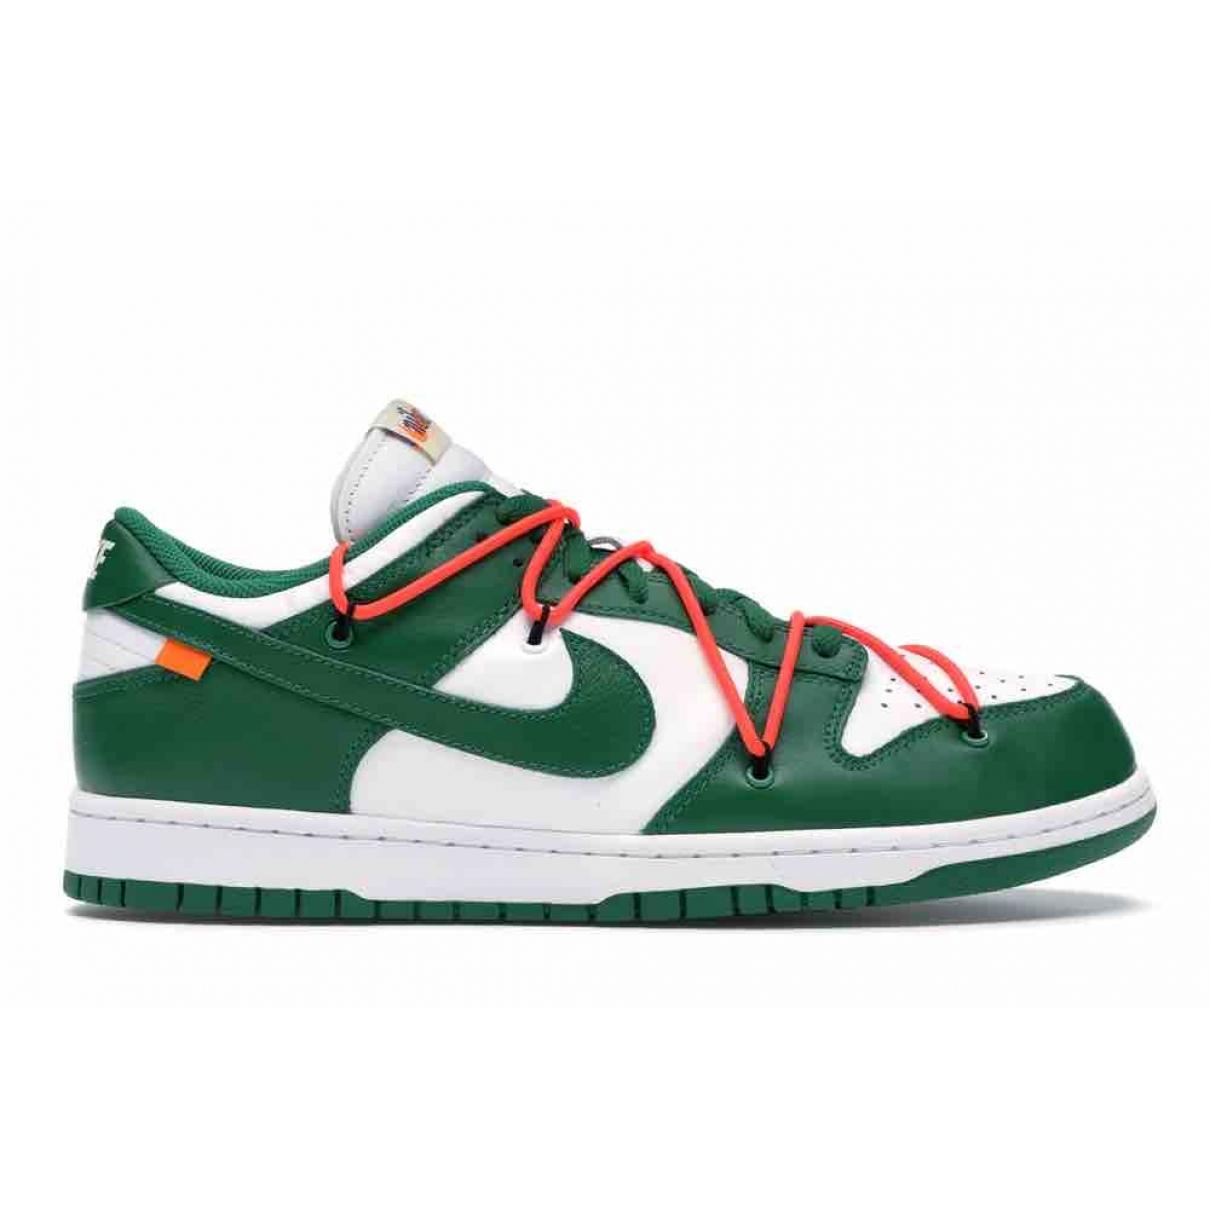 Nike X Off-white - Baskets Dunk Low pour homme en toile - vert